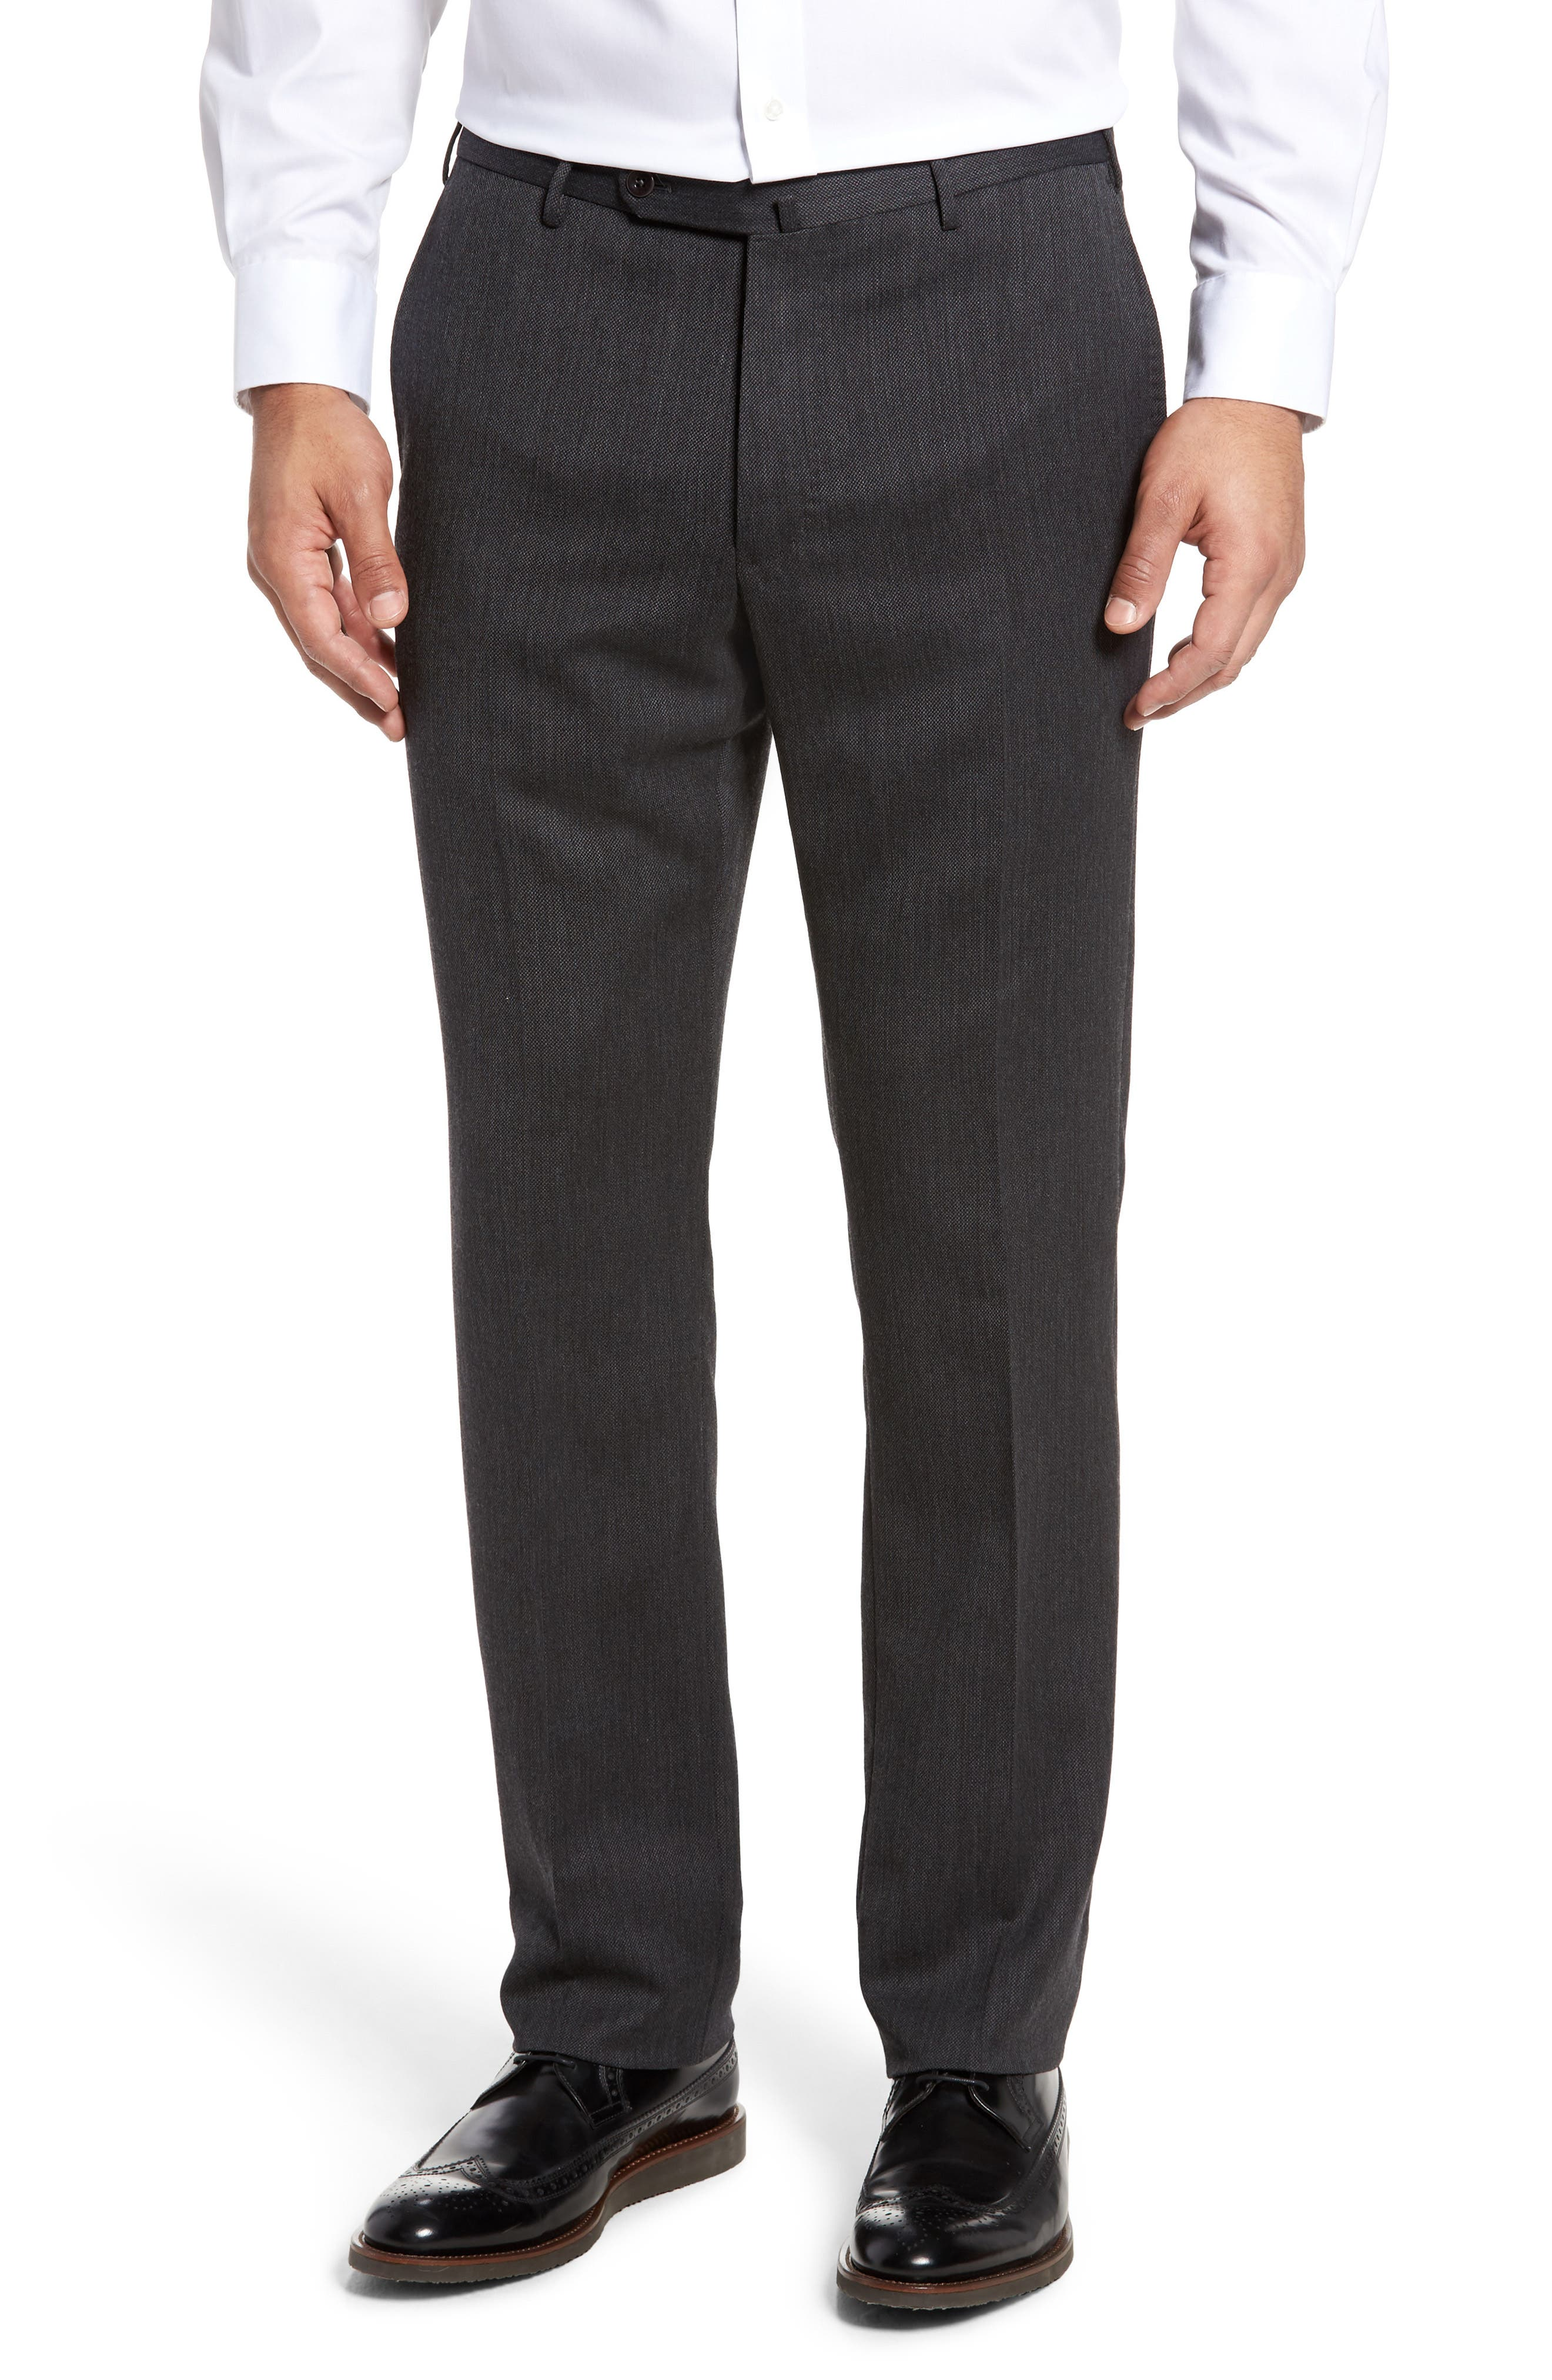 Main Image - Incotex Benson Flat Front Wool Blend Trousers